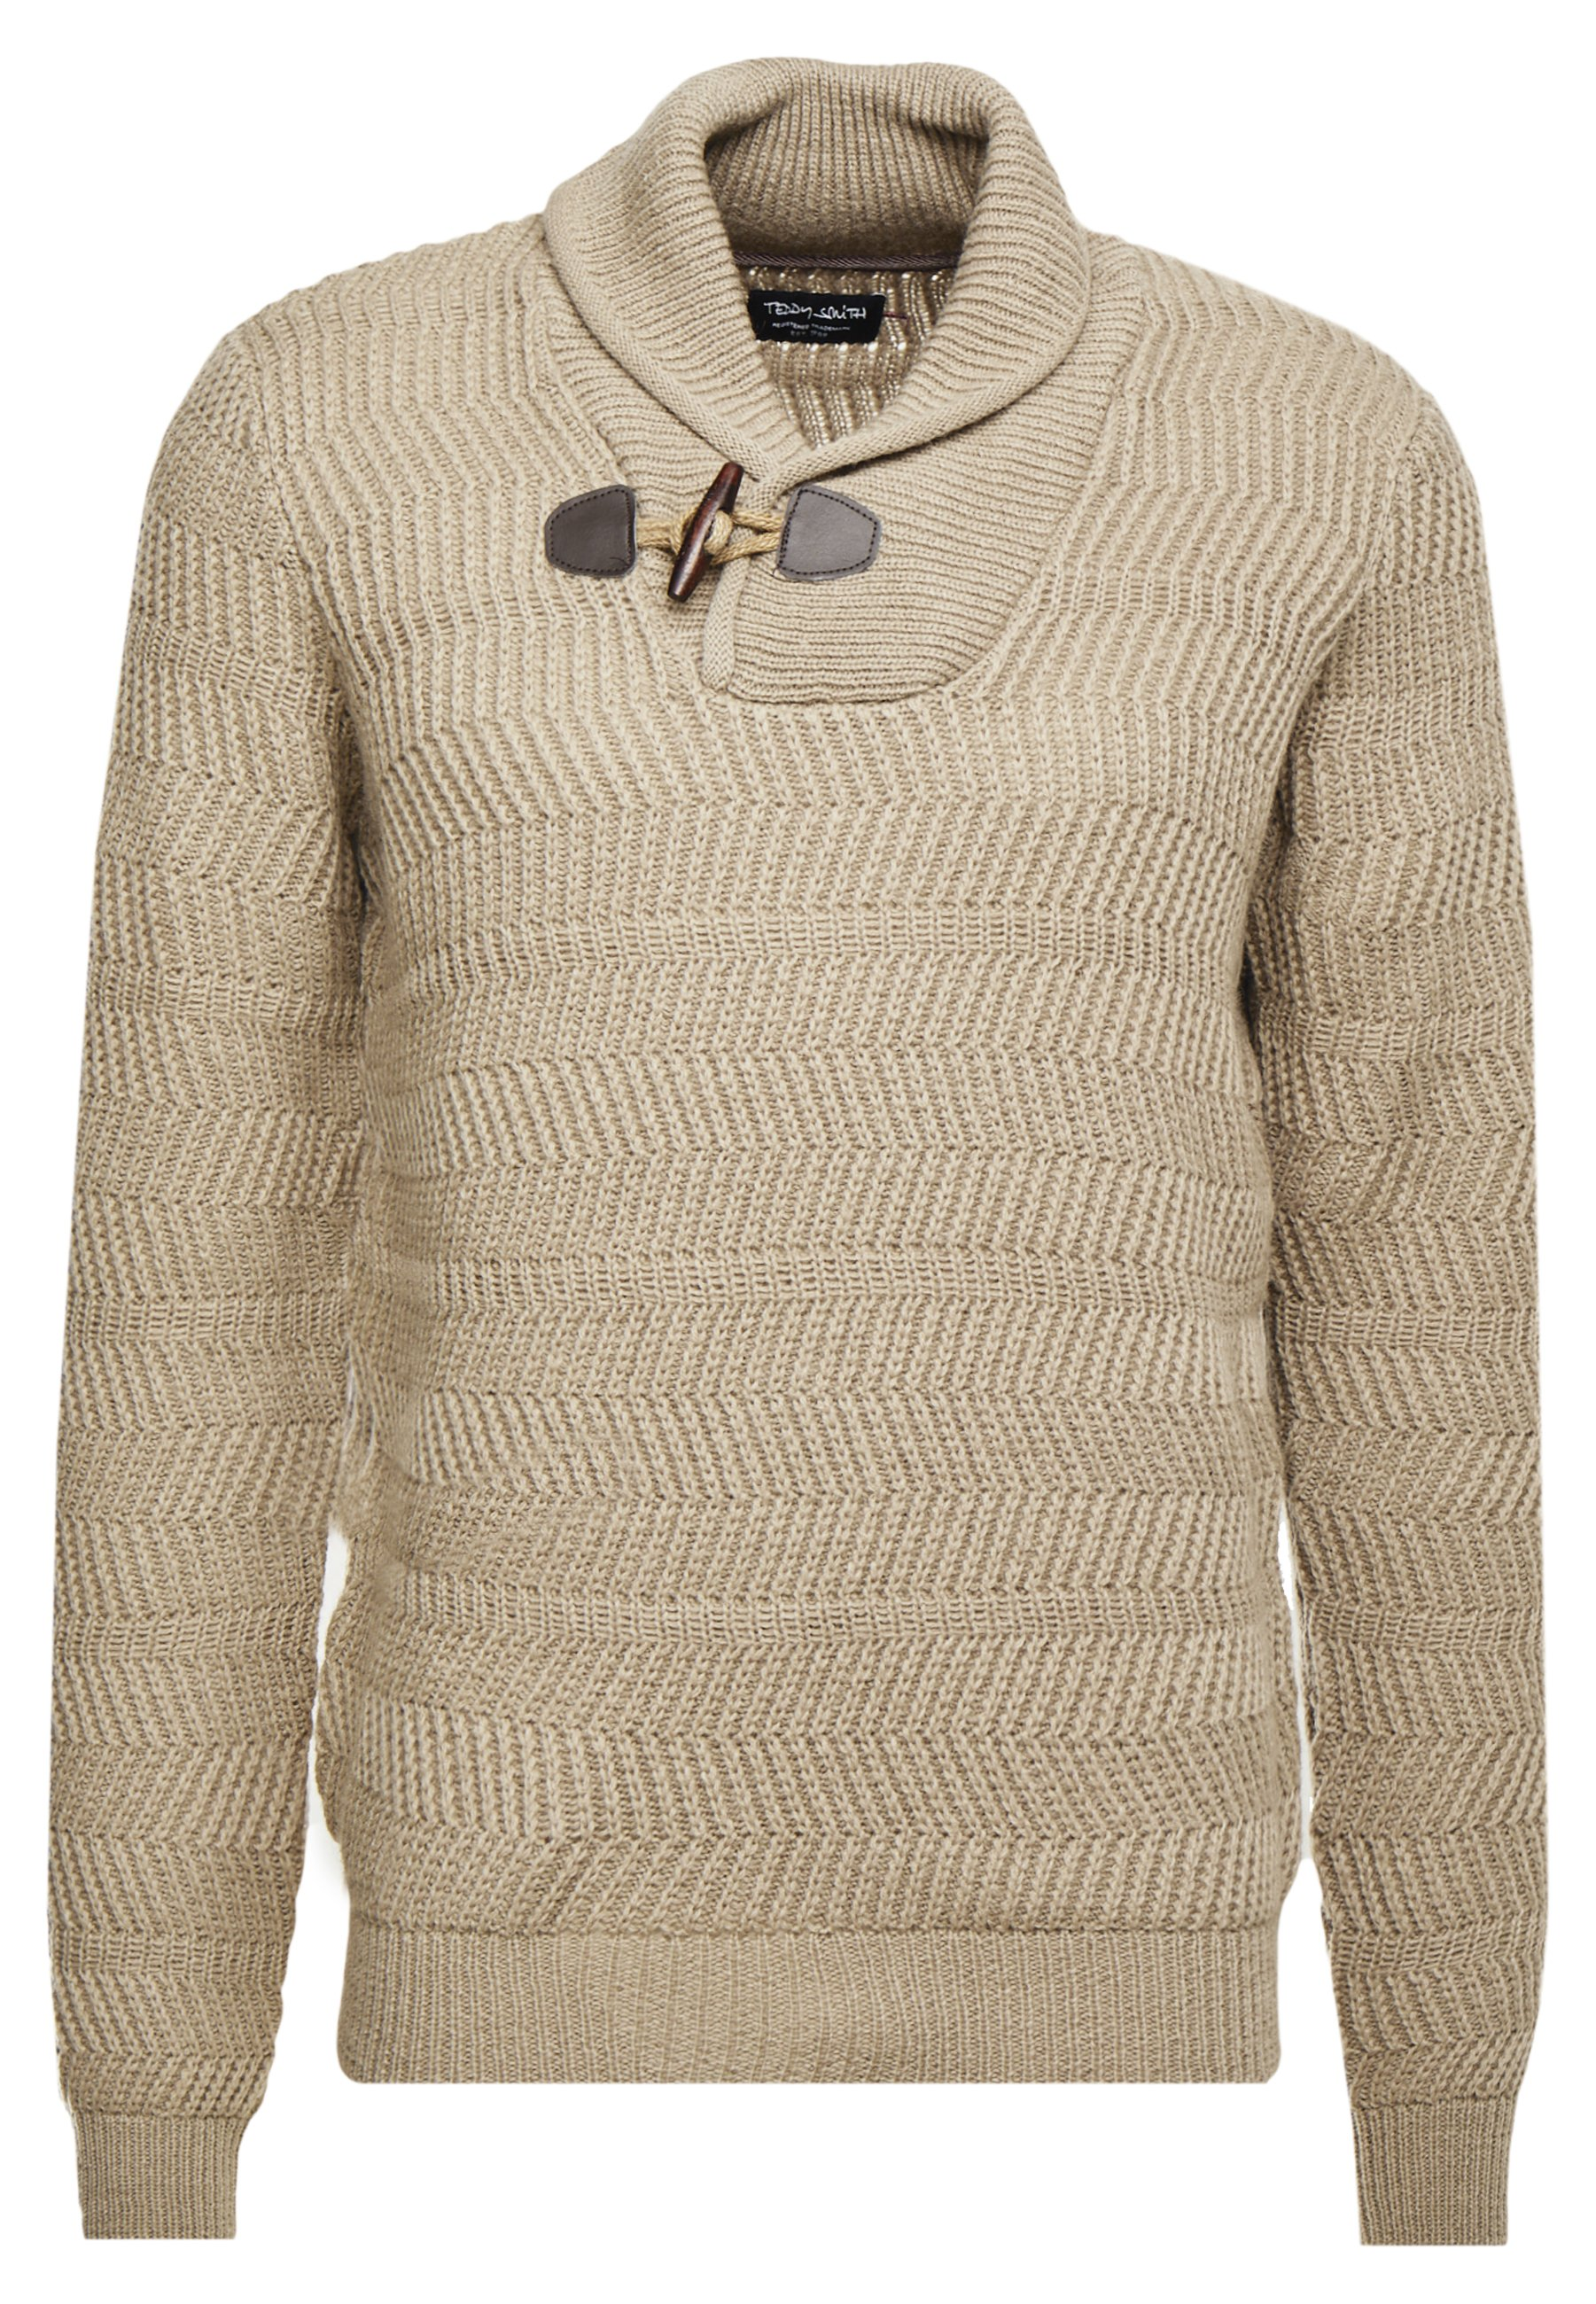 Teddy Smith IRON - Pullover - beige chine/